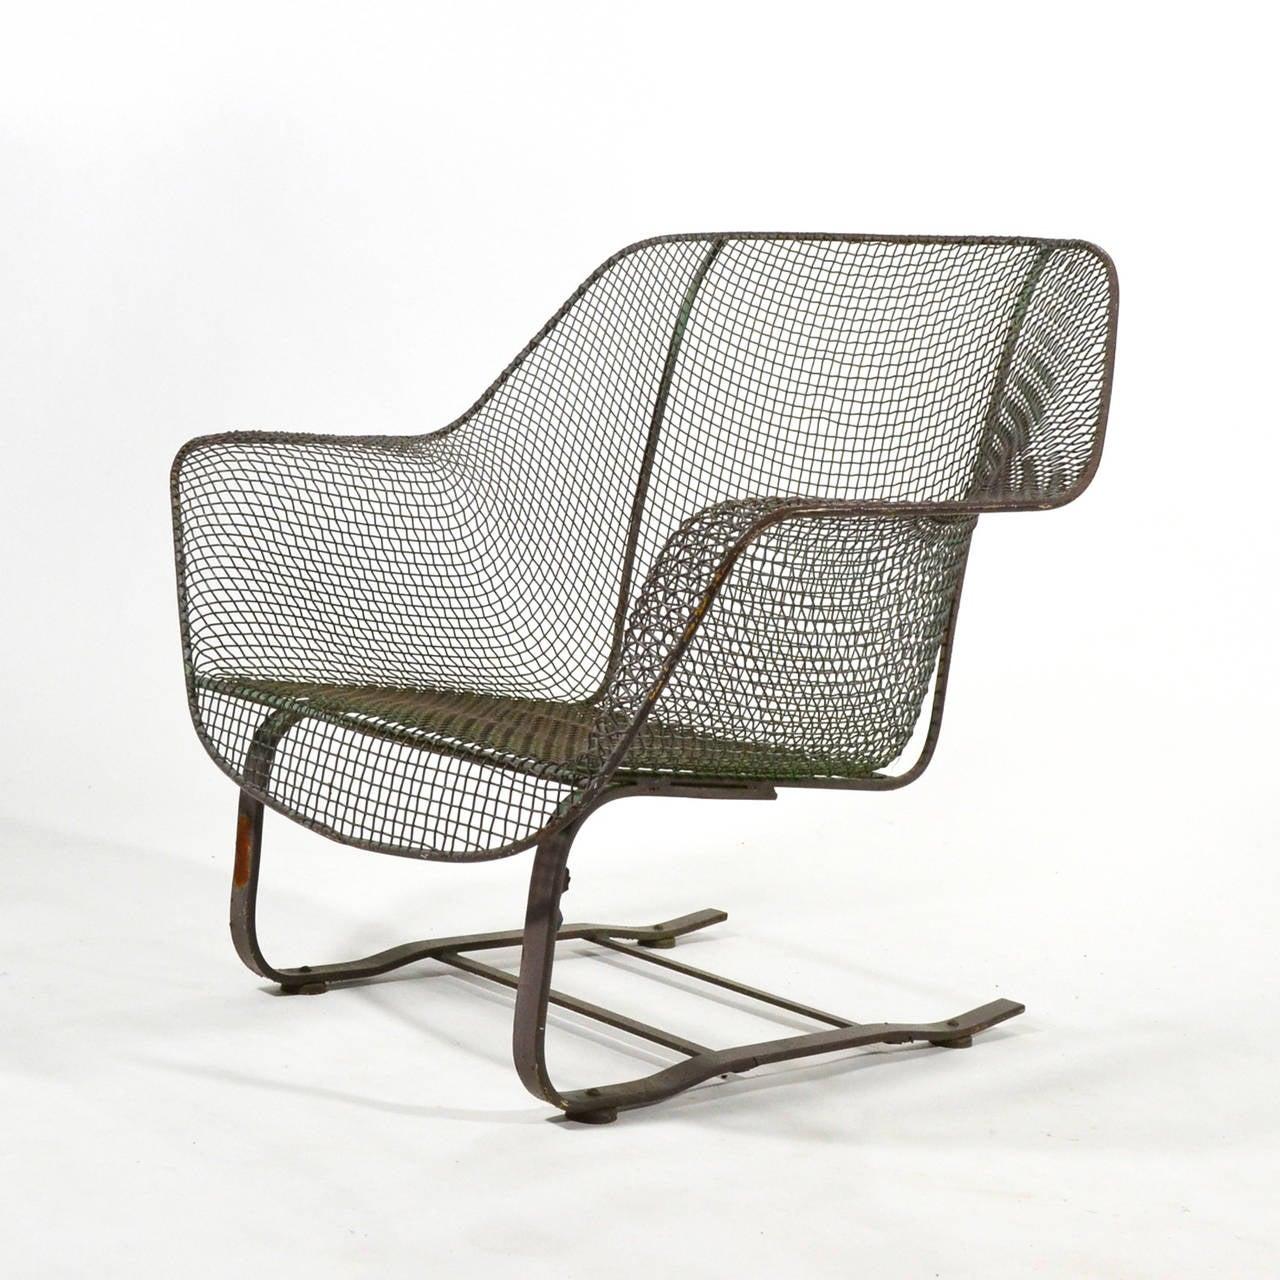 Woodard Sculptura Cantilevered Lounge Chair at 1stdibs